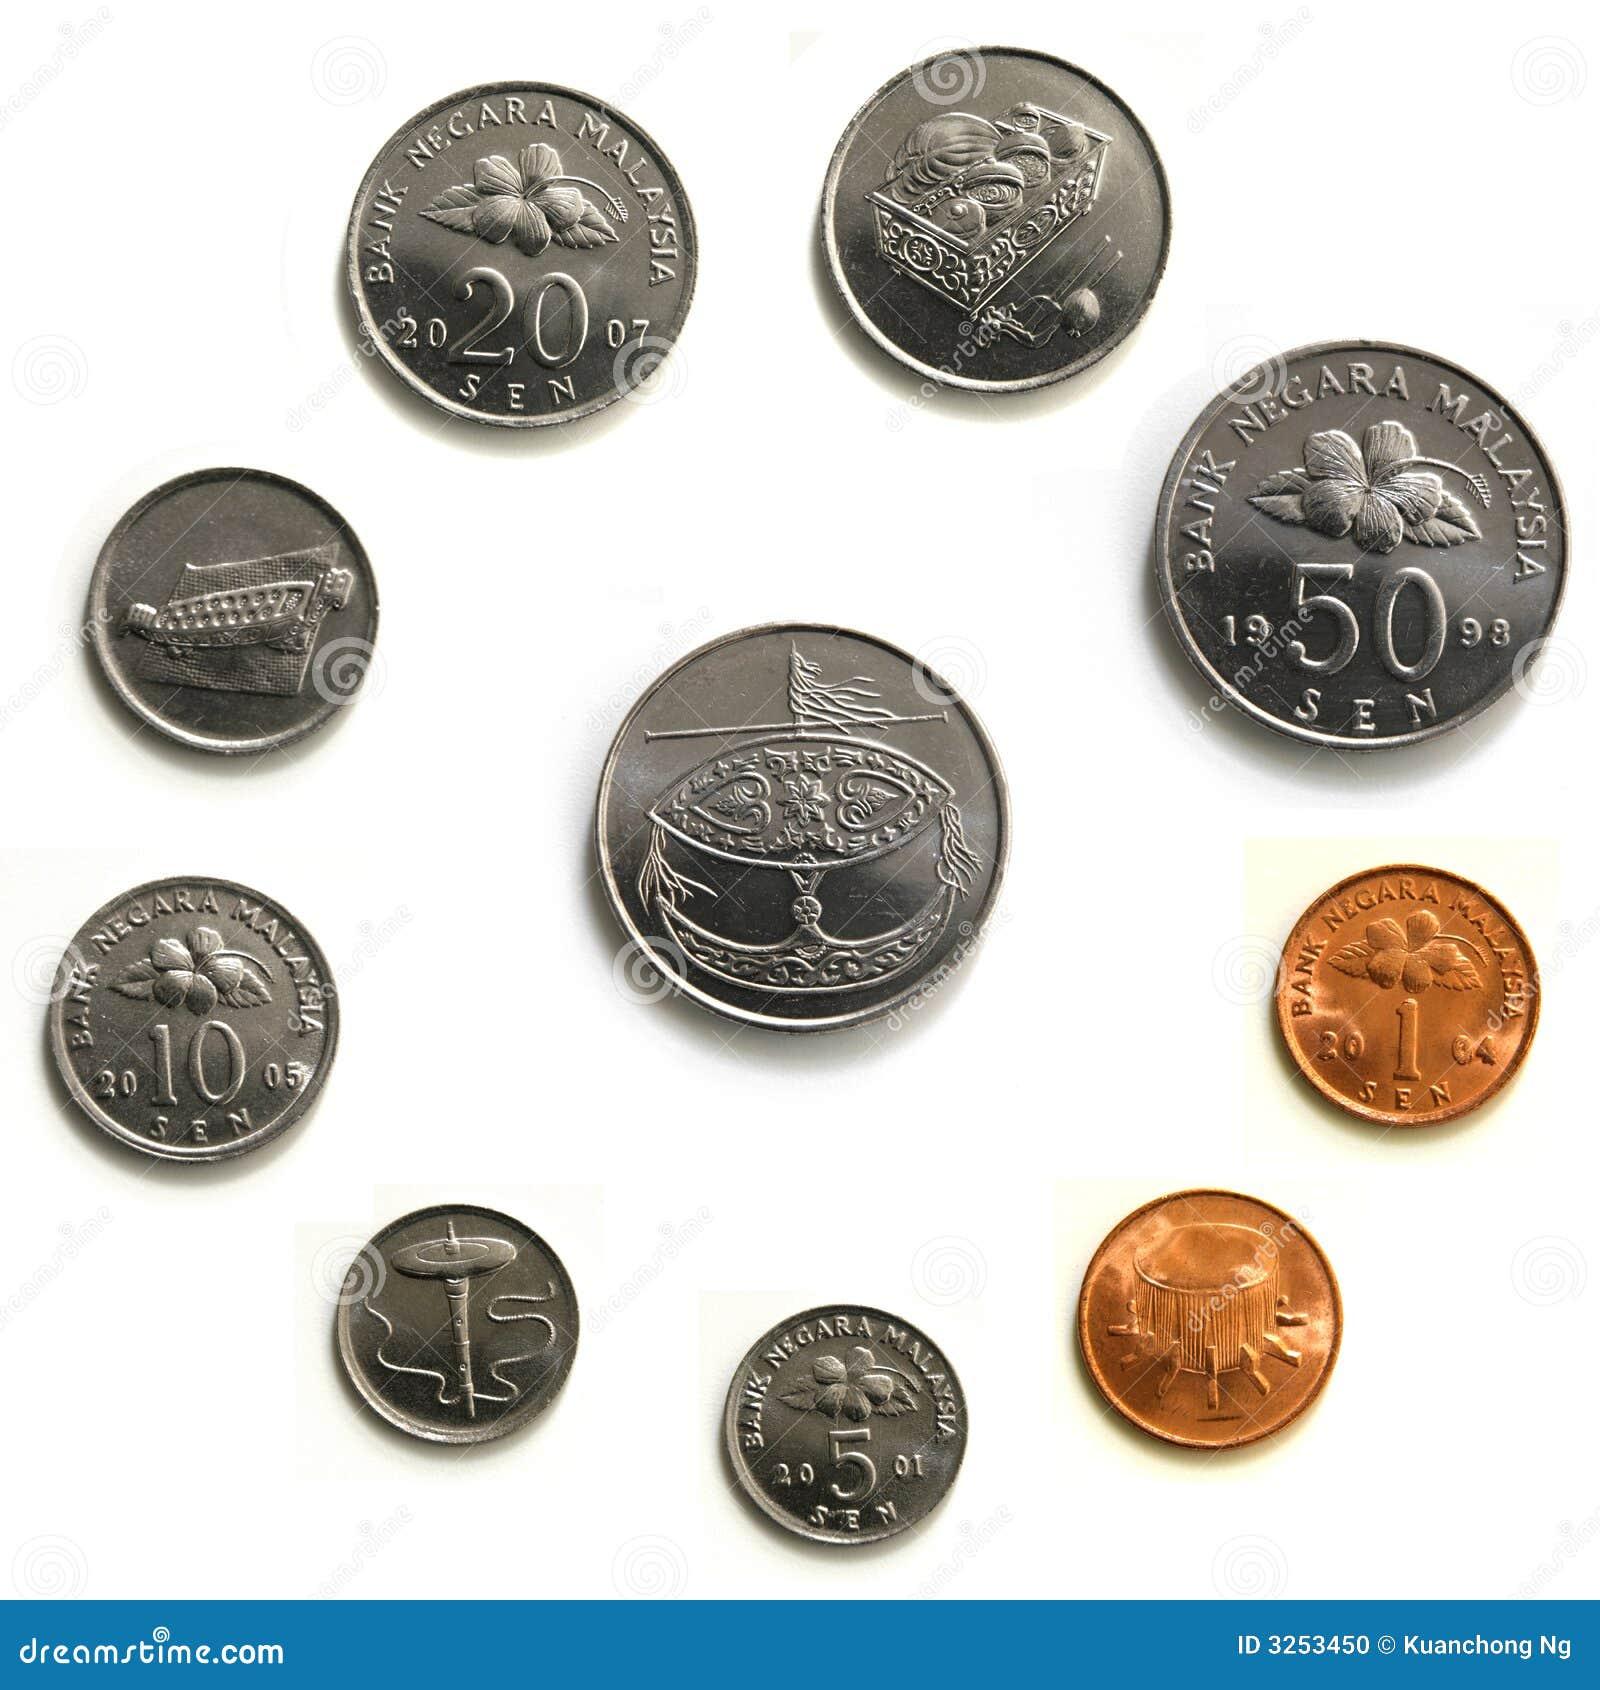 Fc coin value malaysia - Cryptokitties clone